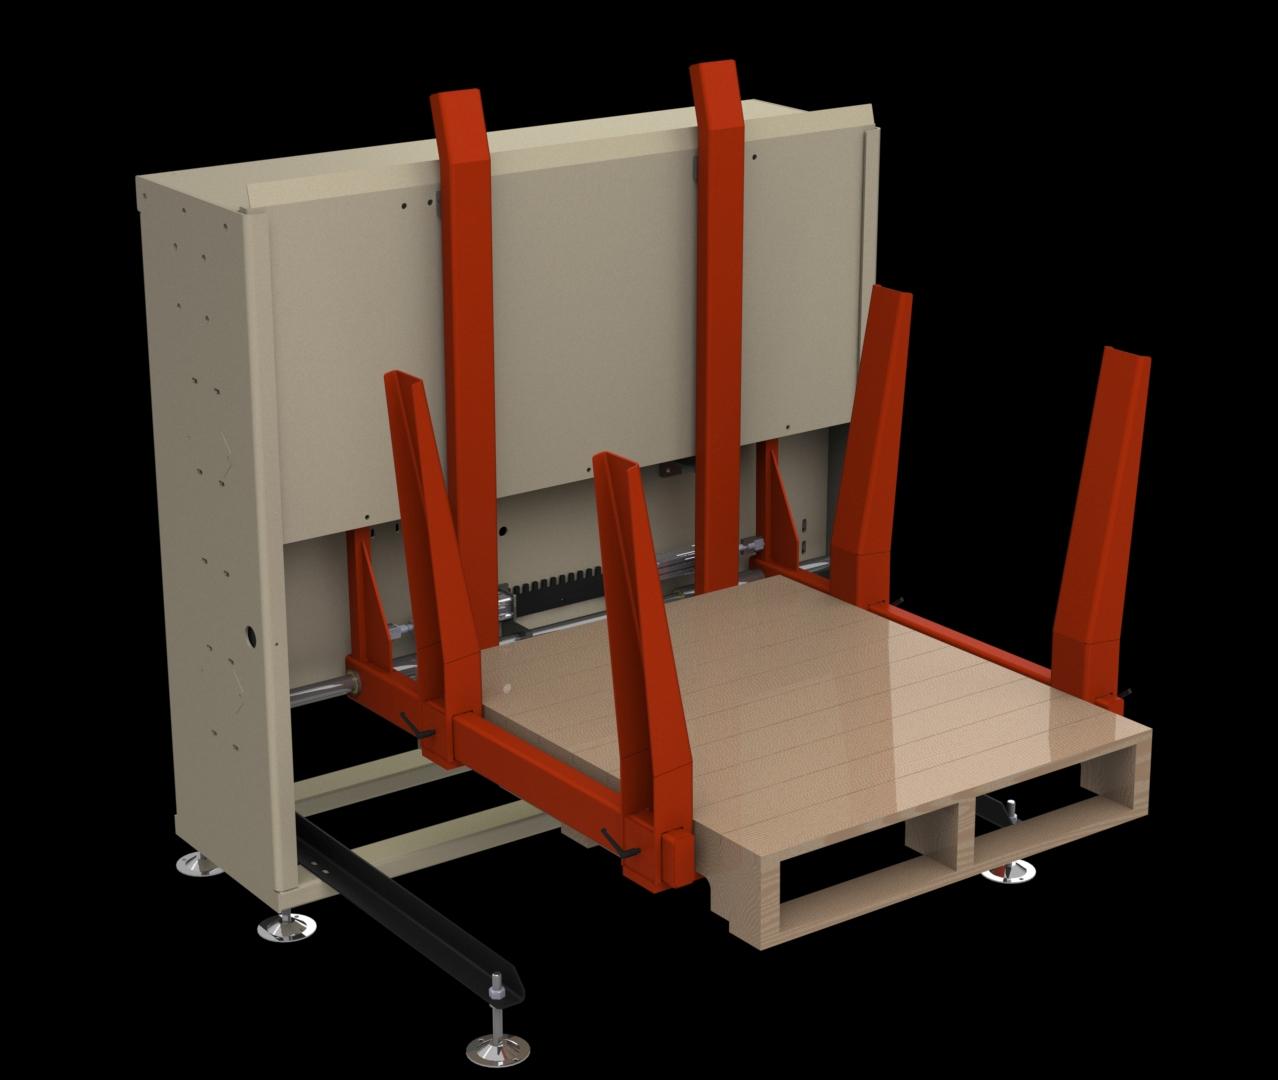 Advantage Pd 4830 Pallet Dispenser Destacker Jantz Canada